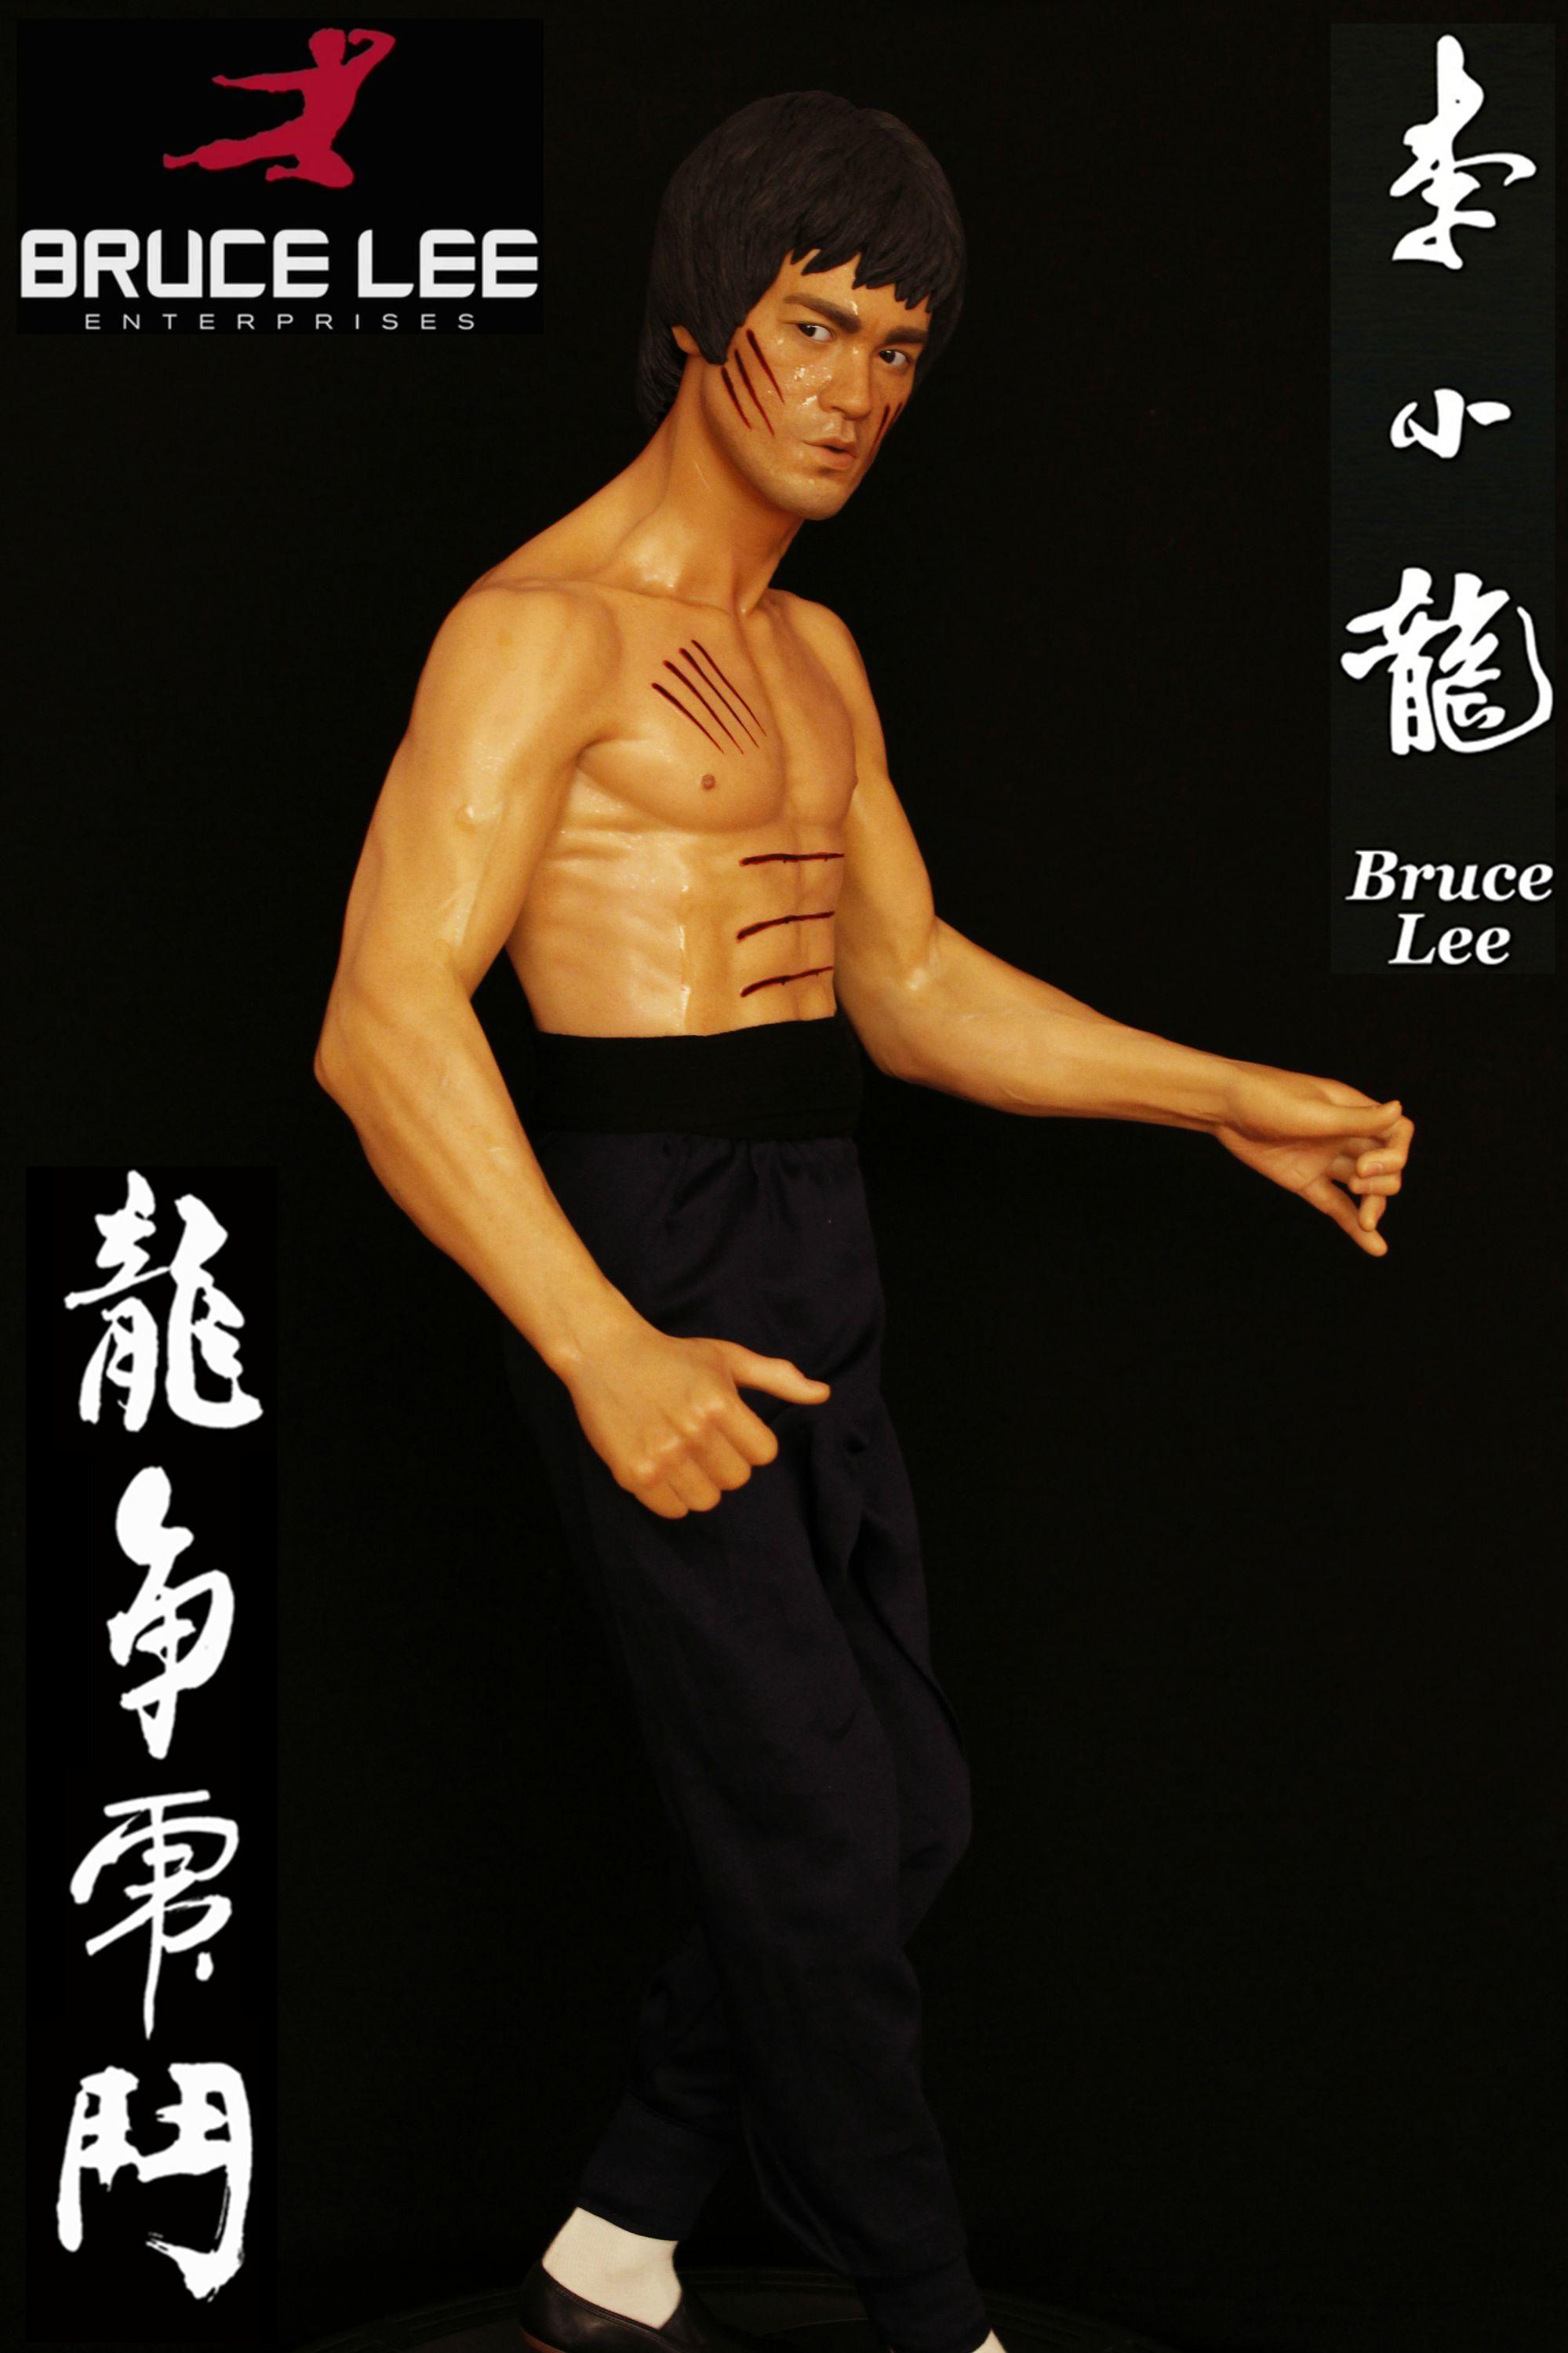 [Blitzway] Bruce Lee Tribute - 1/3 Scale - LANÇADO!!! - Página 6 212653gqwfzaqcf8p0rckw